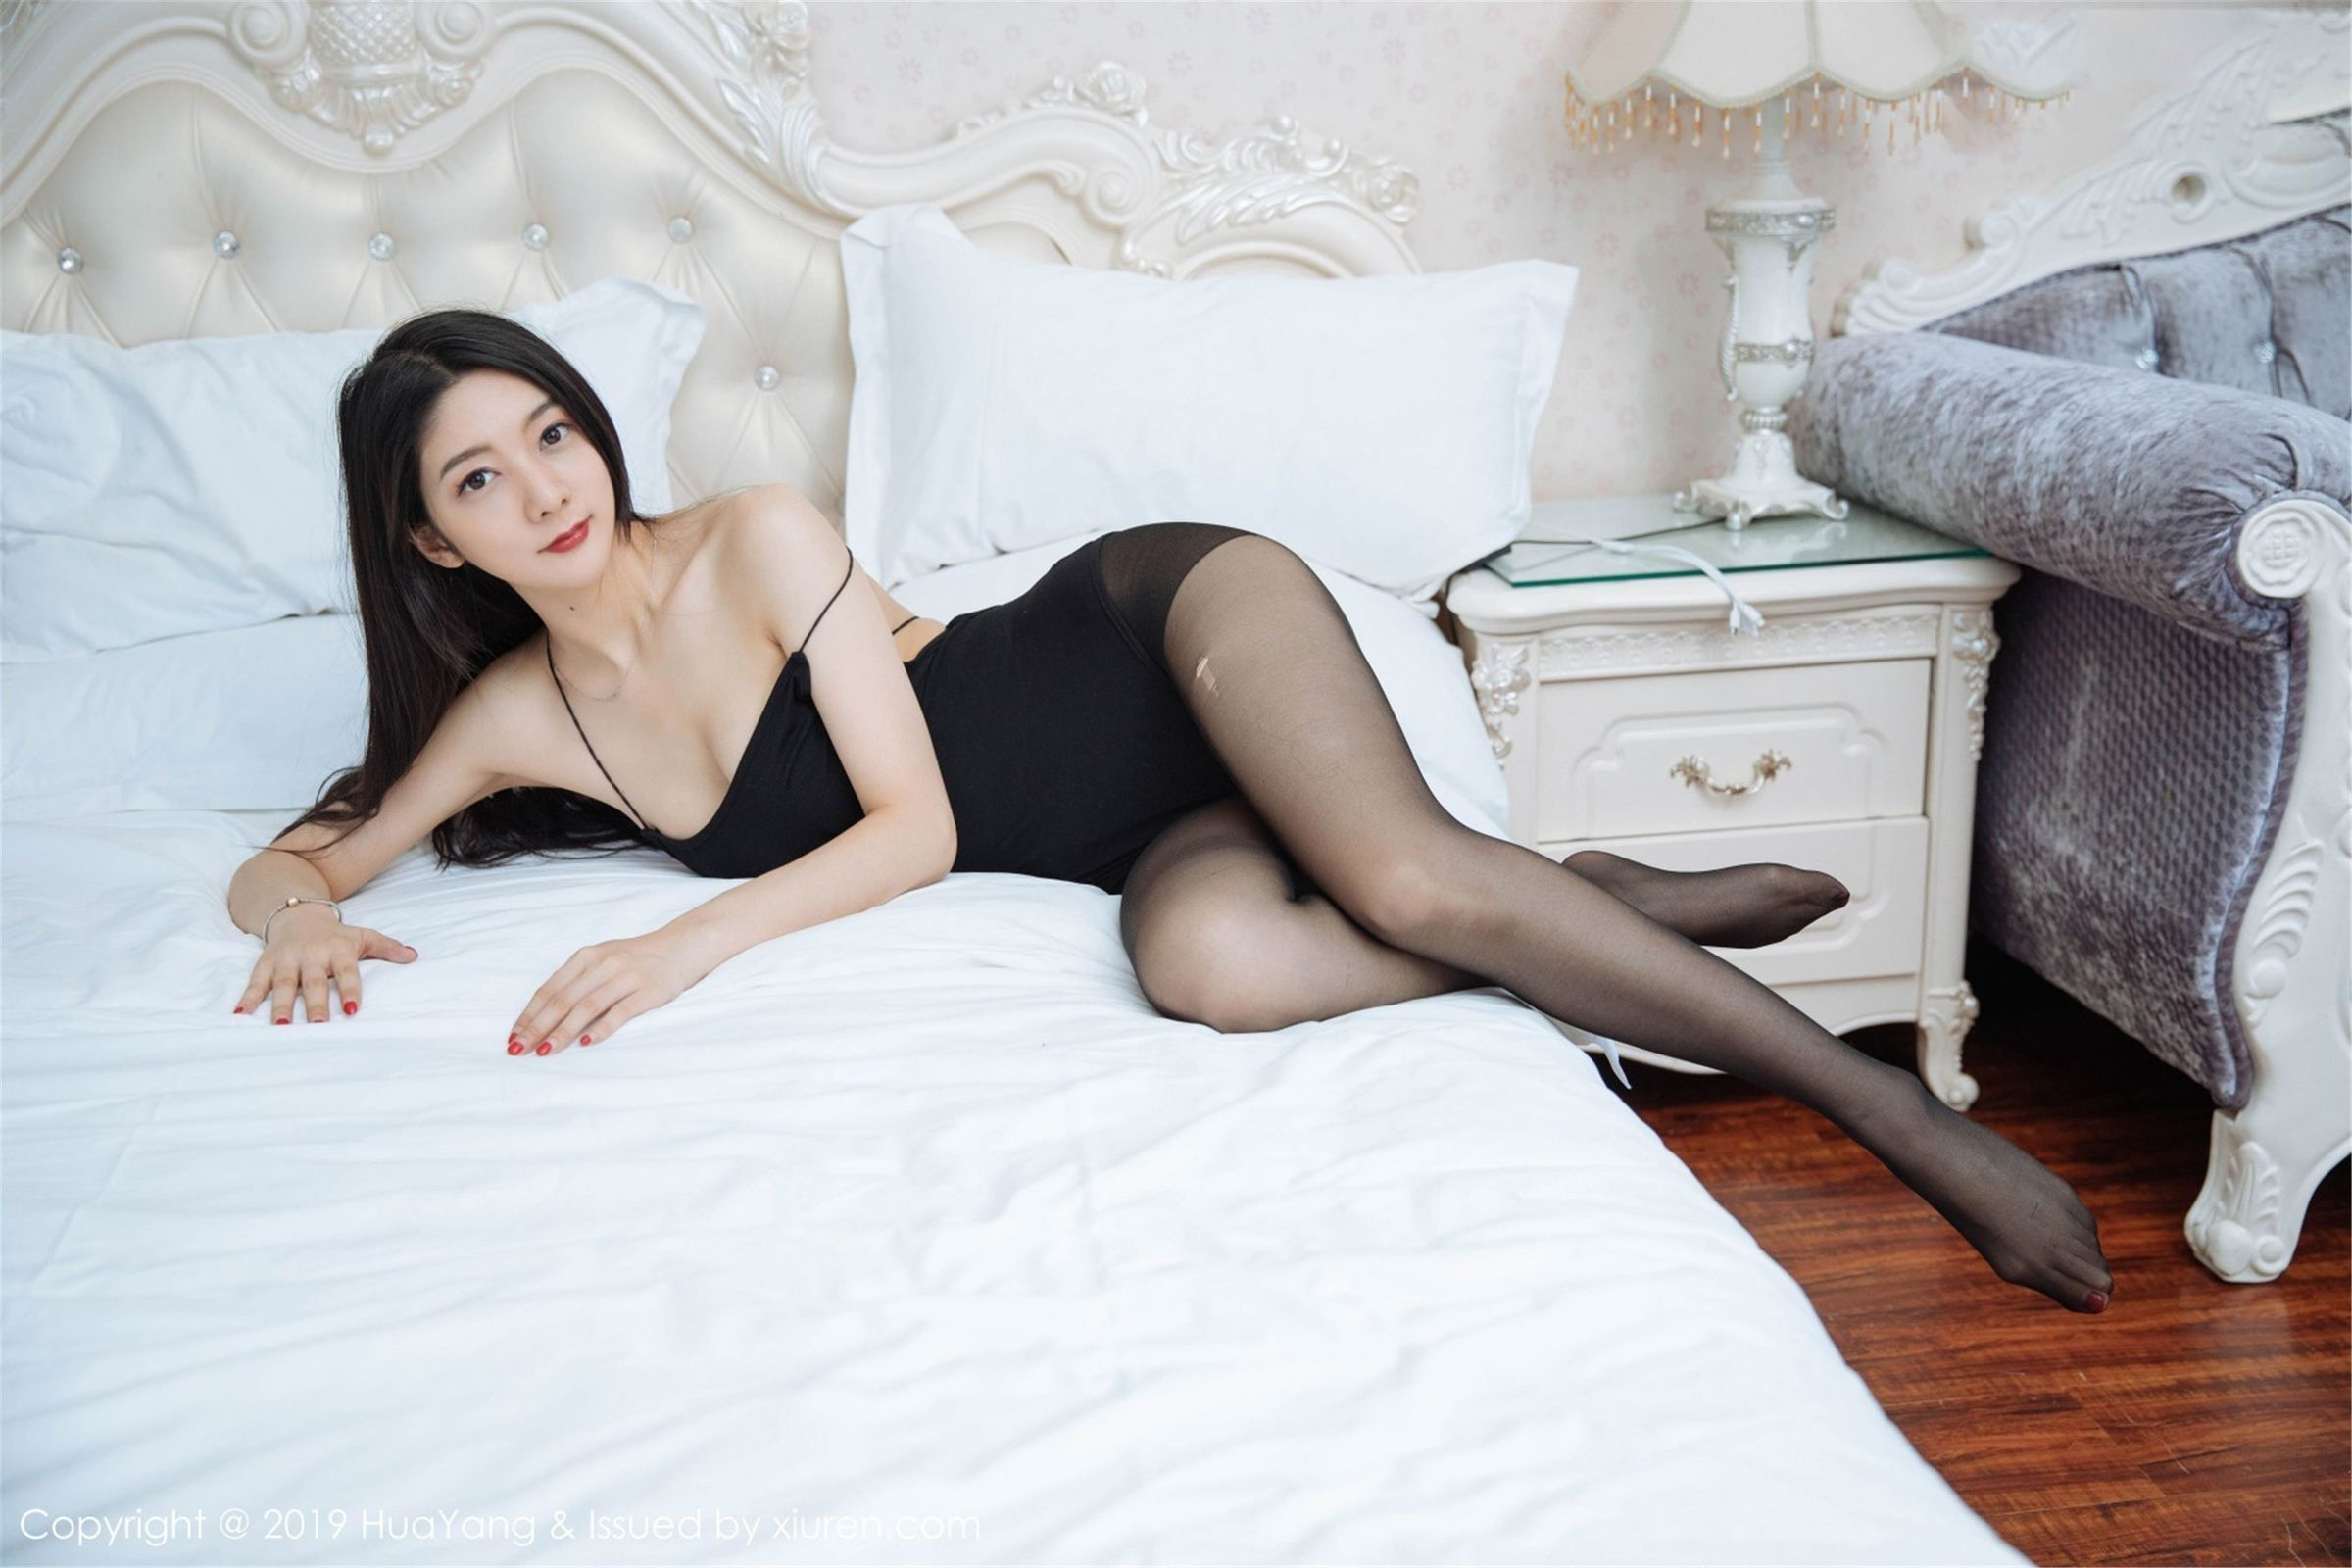 MVSD-276绝美纯白香肩性感美女 床榻的诱惑